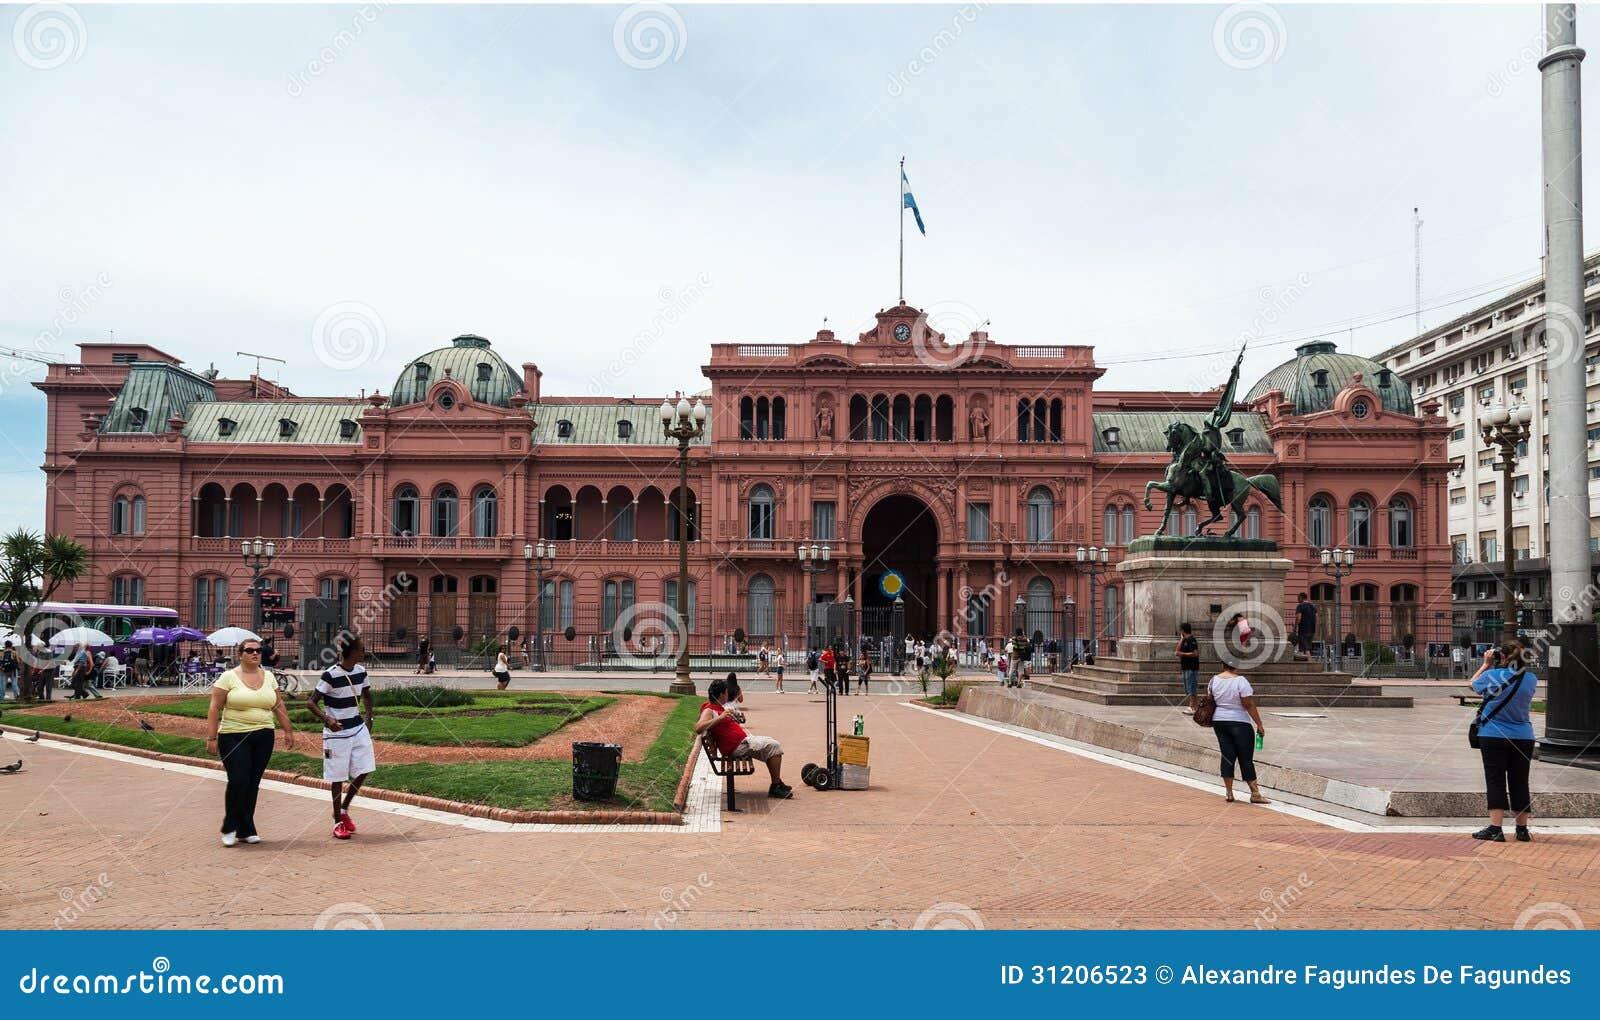 Belgrano general casa rosada argentina editorial stock for Casa argentina